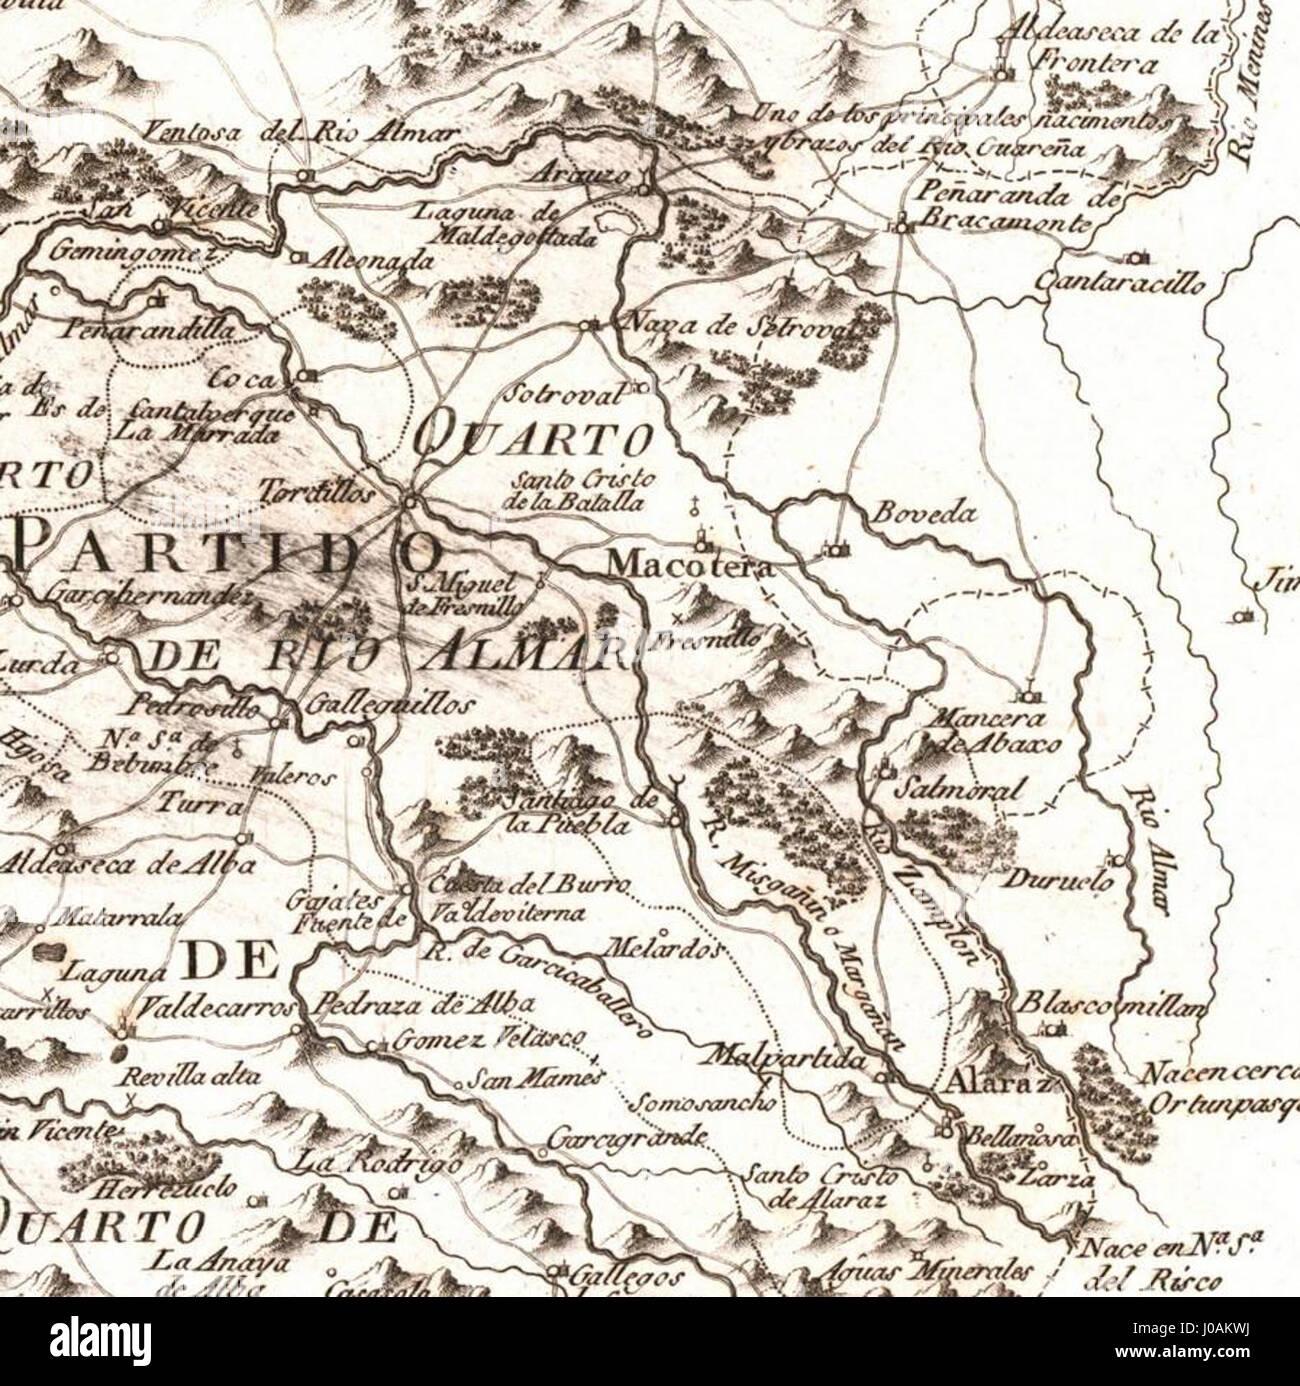 Provincia De Salamanca Mapa.Quarto Del Rio Almar Mapa Geografico De La Provincia De